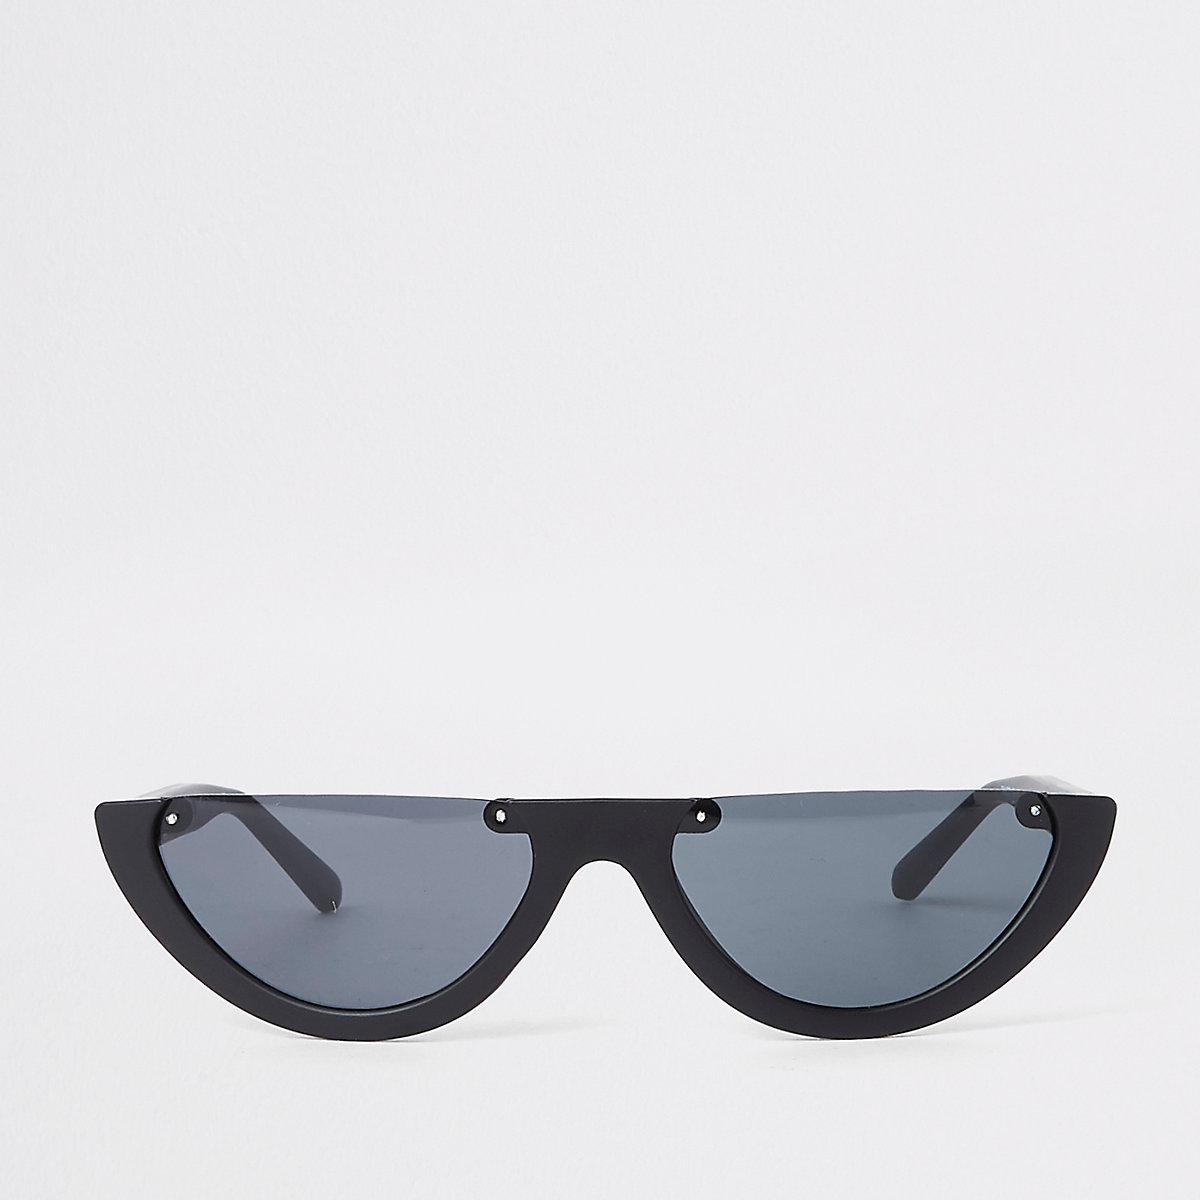 Black smoke lens half-frame sunglasses